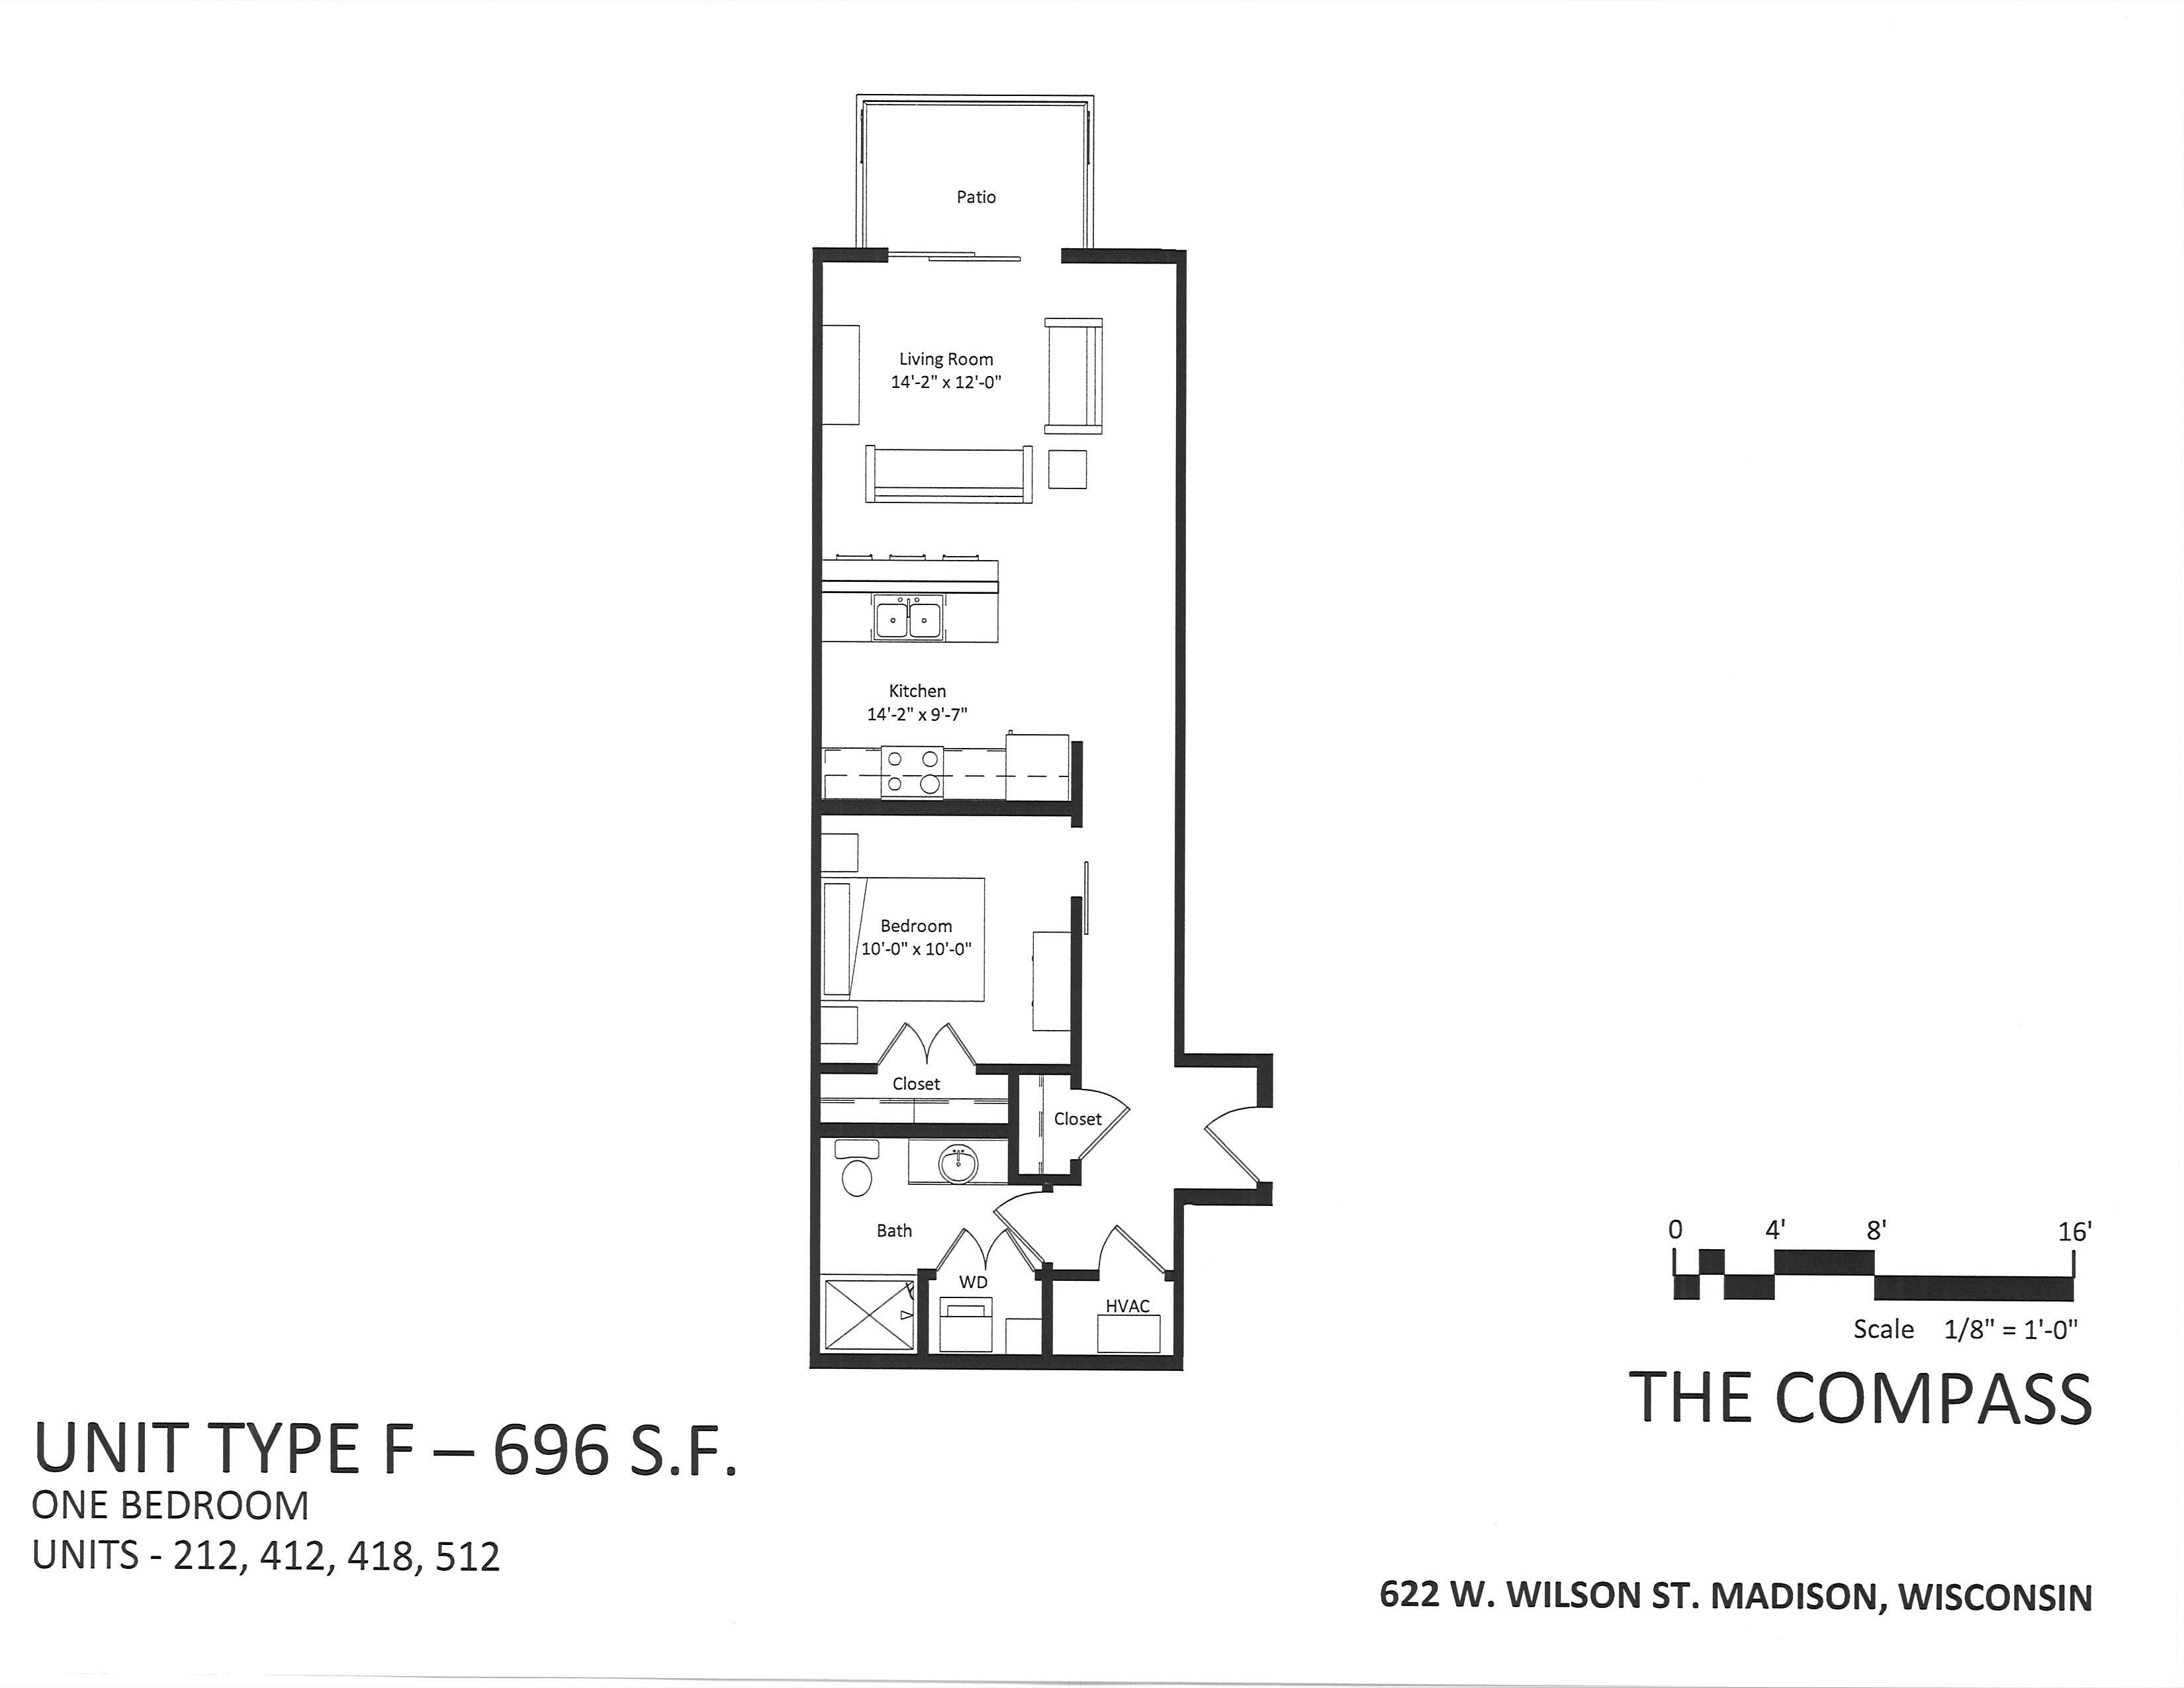 622 W. Wilson St. #418